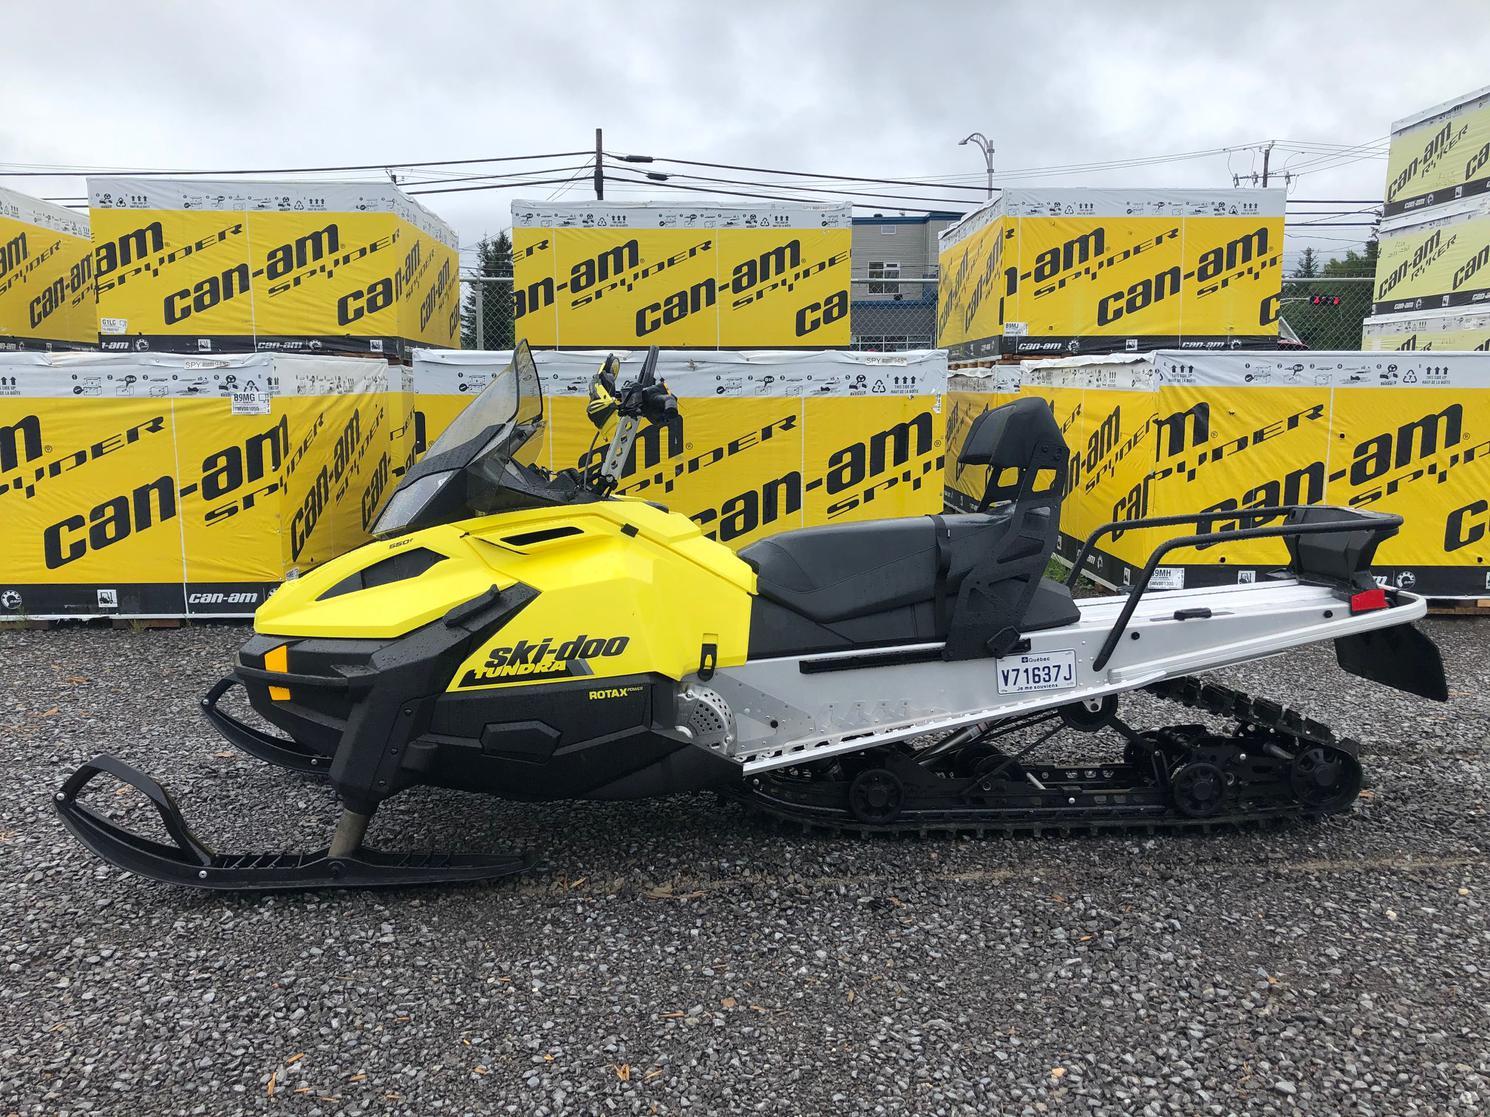 40806 Ski-Doo TUNDRA LT 550F 2020